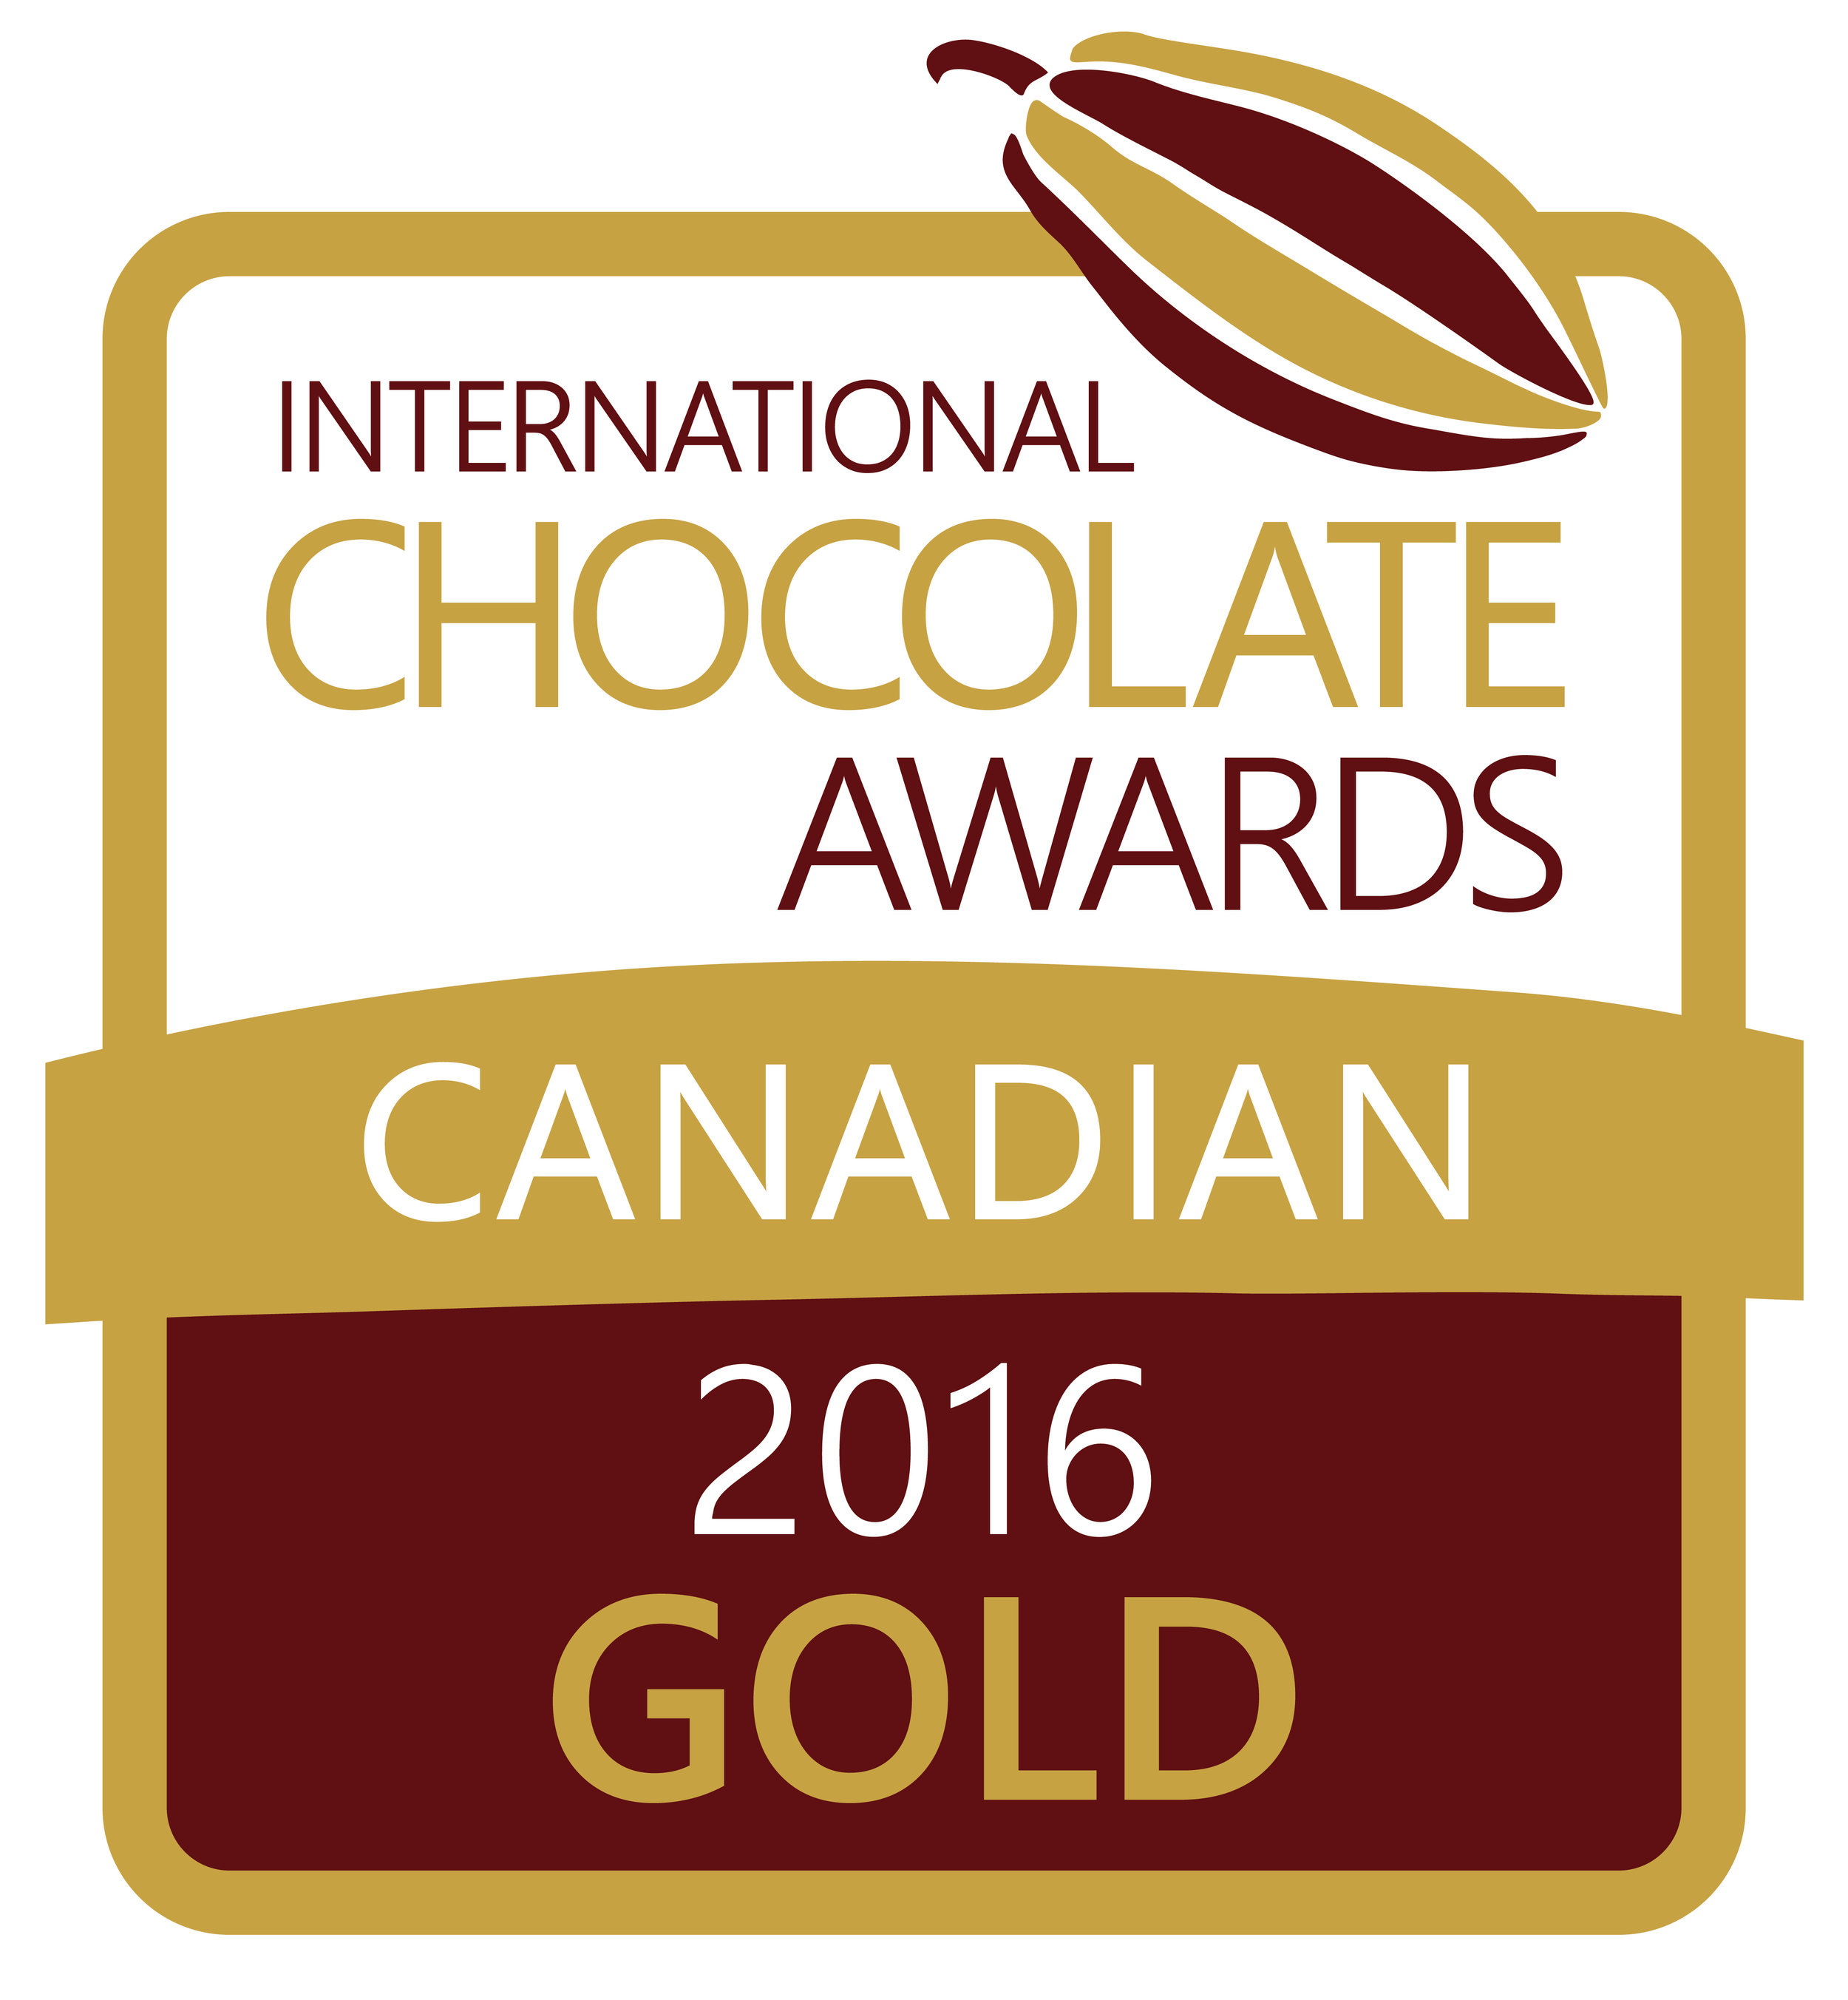 2016 Canadian Gold Winner International Chocolate Awards